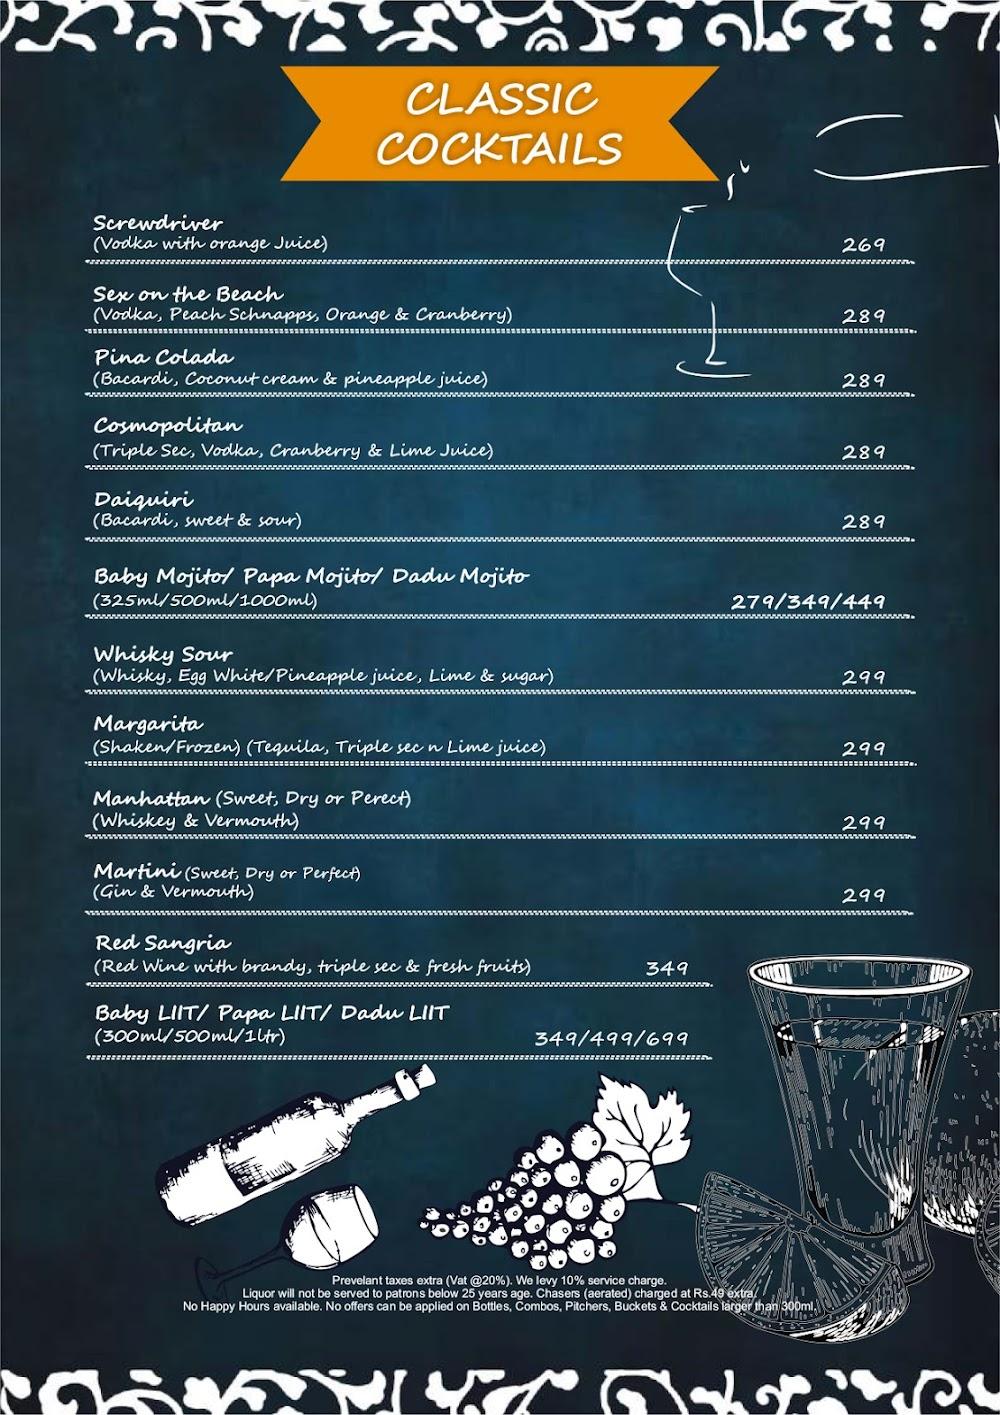 Chill'm Bar & Cafe menu 7